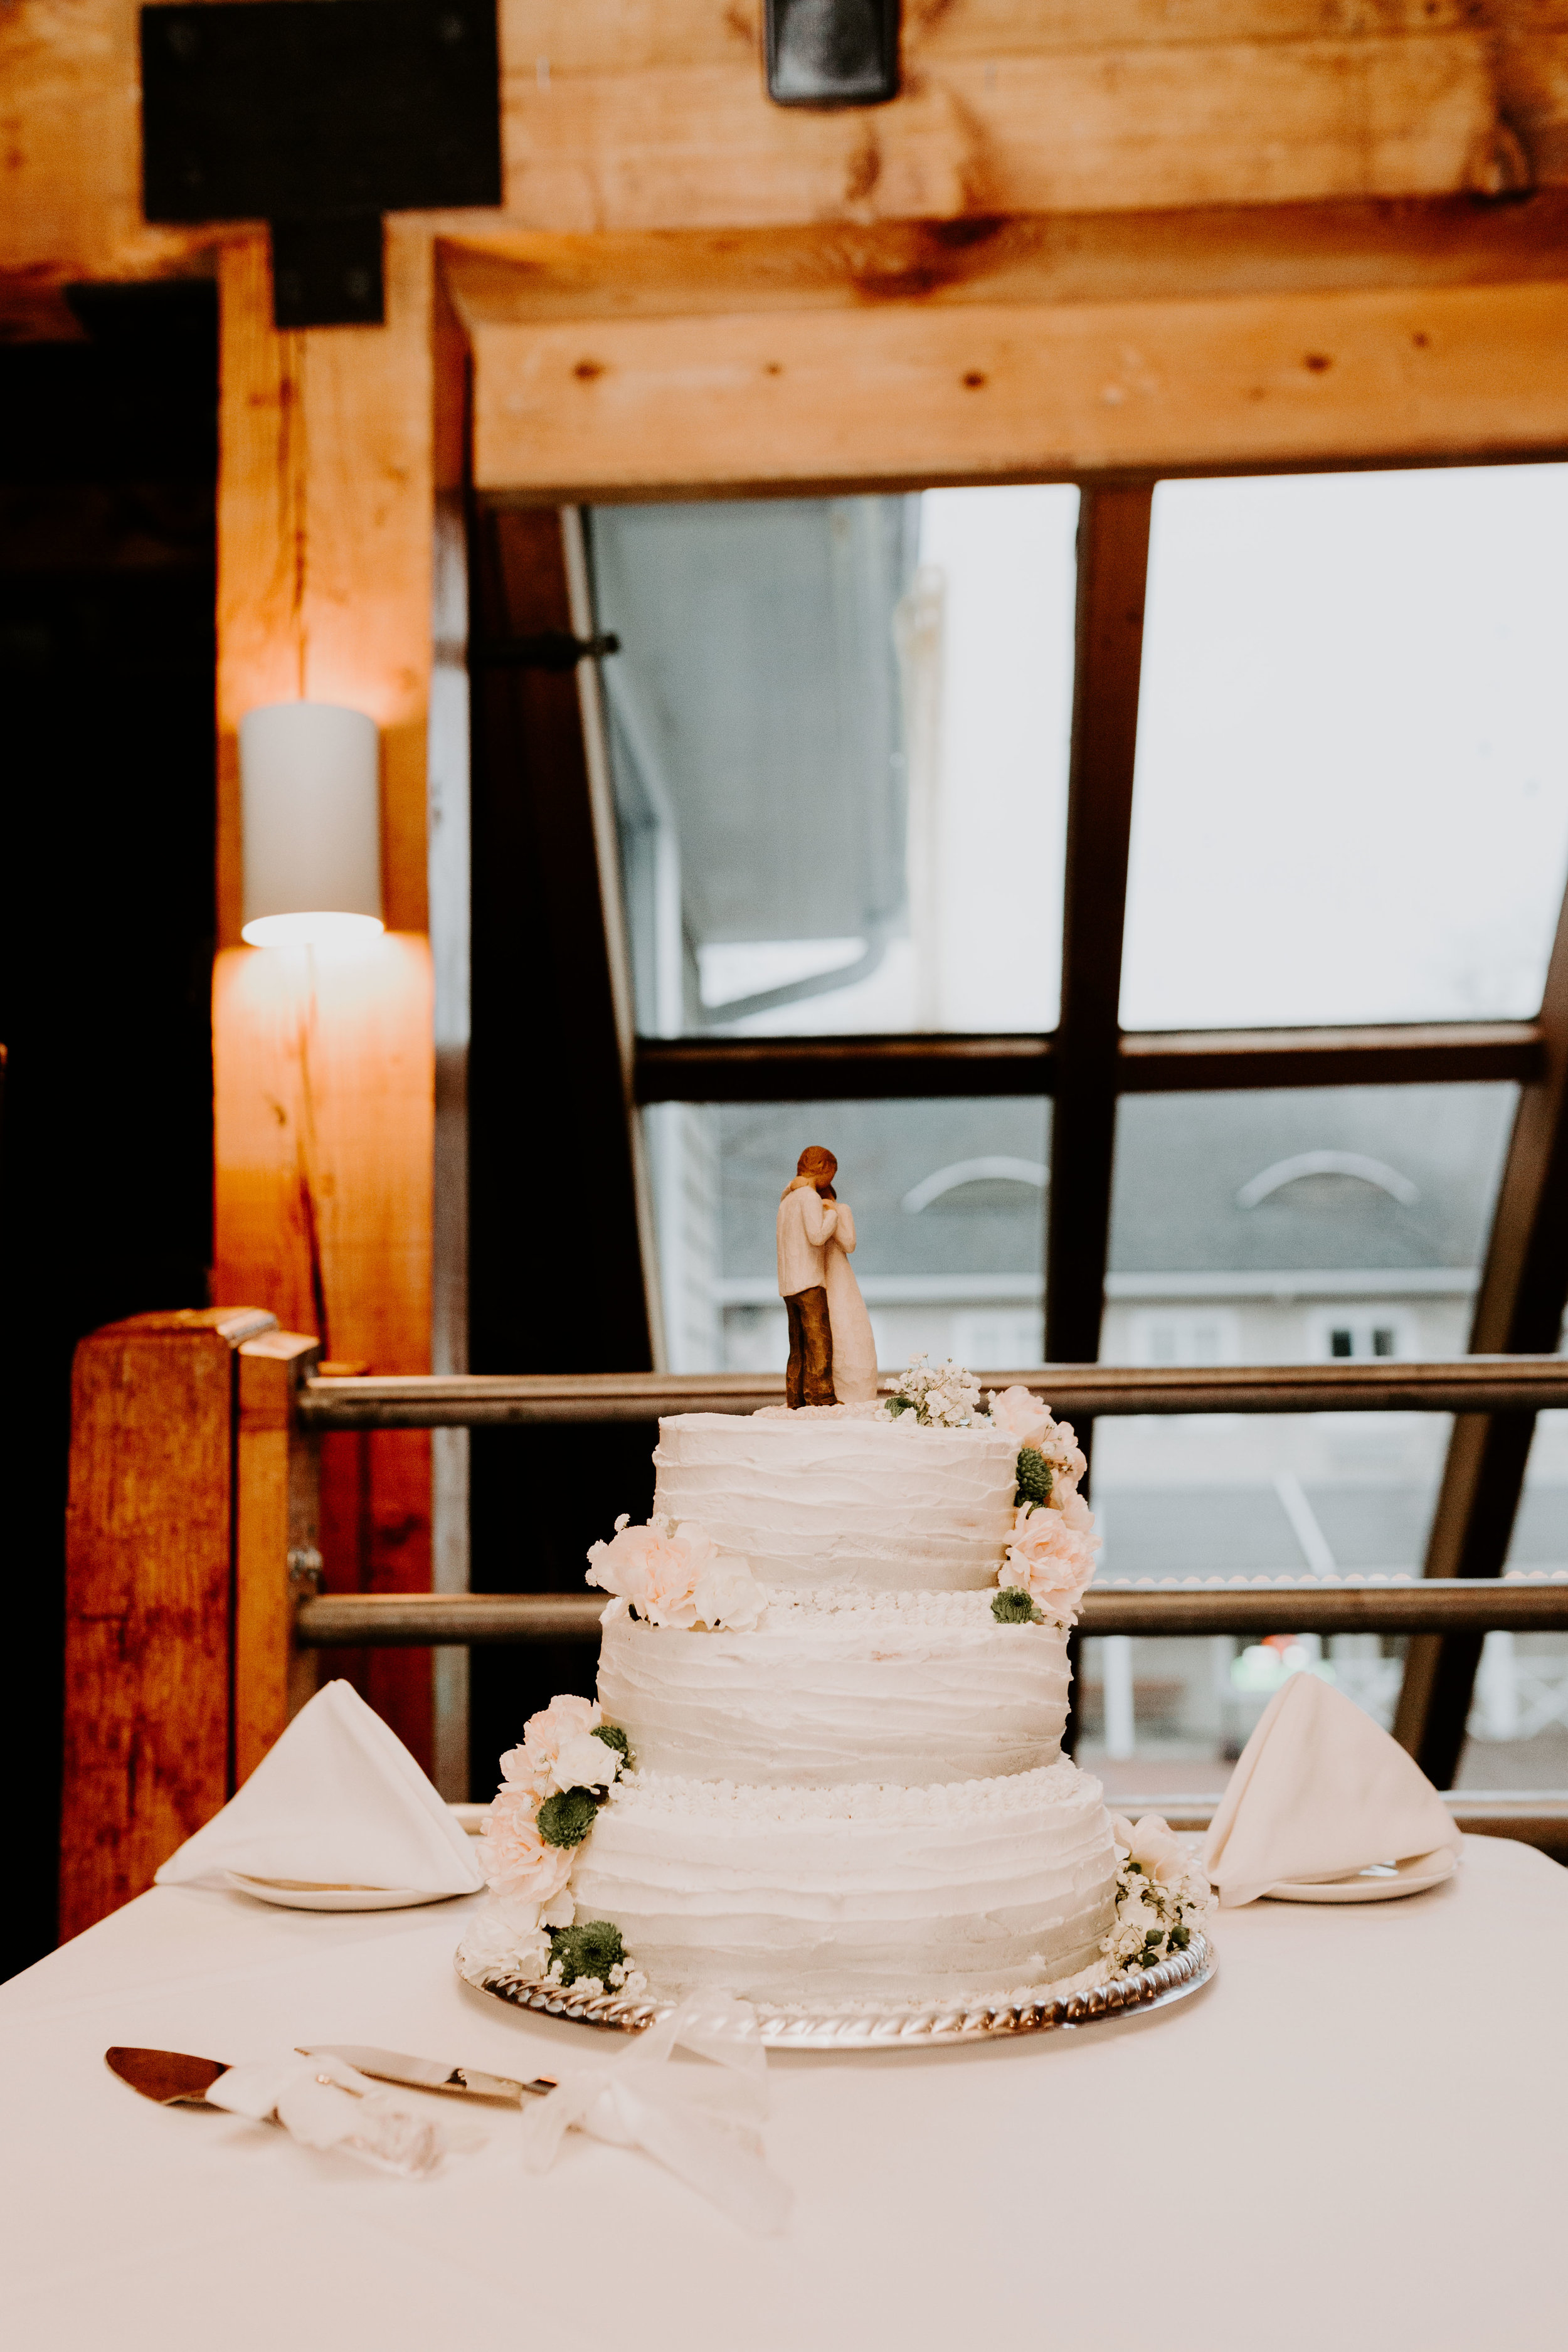 nicole-daacke-photography-boston-massachusetts-seaside-intimate-winter-wedding-photographer-50.jpg